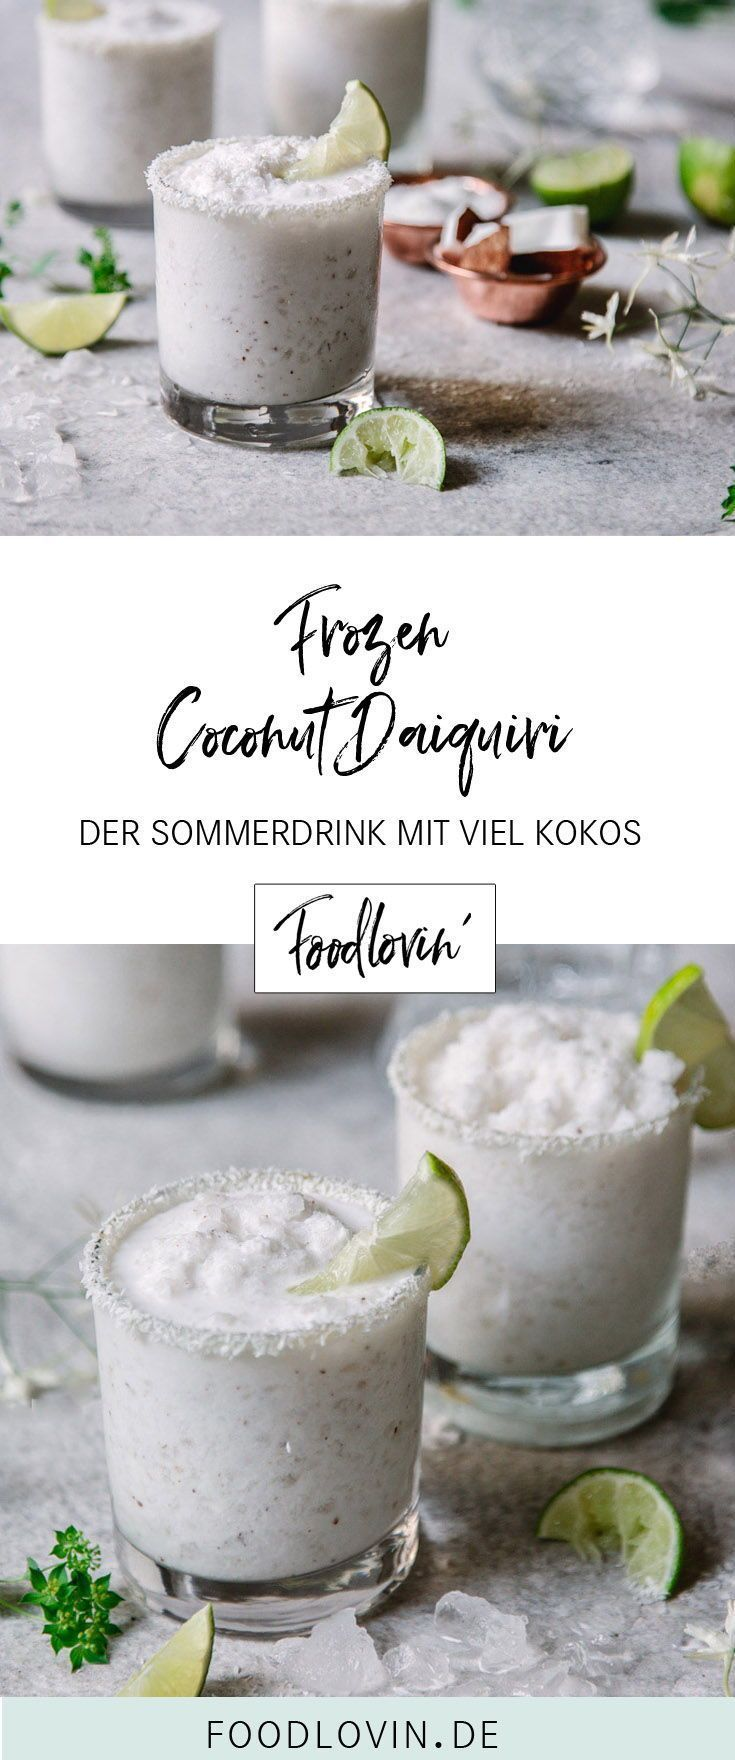 Frozen Coconut Daiquiri